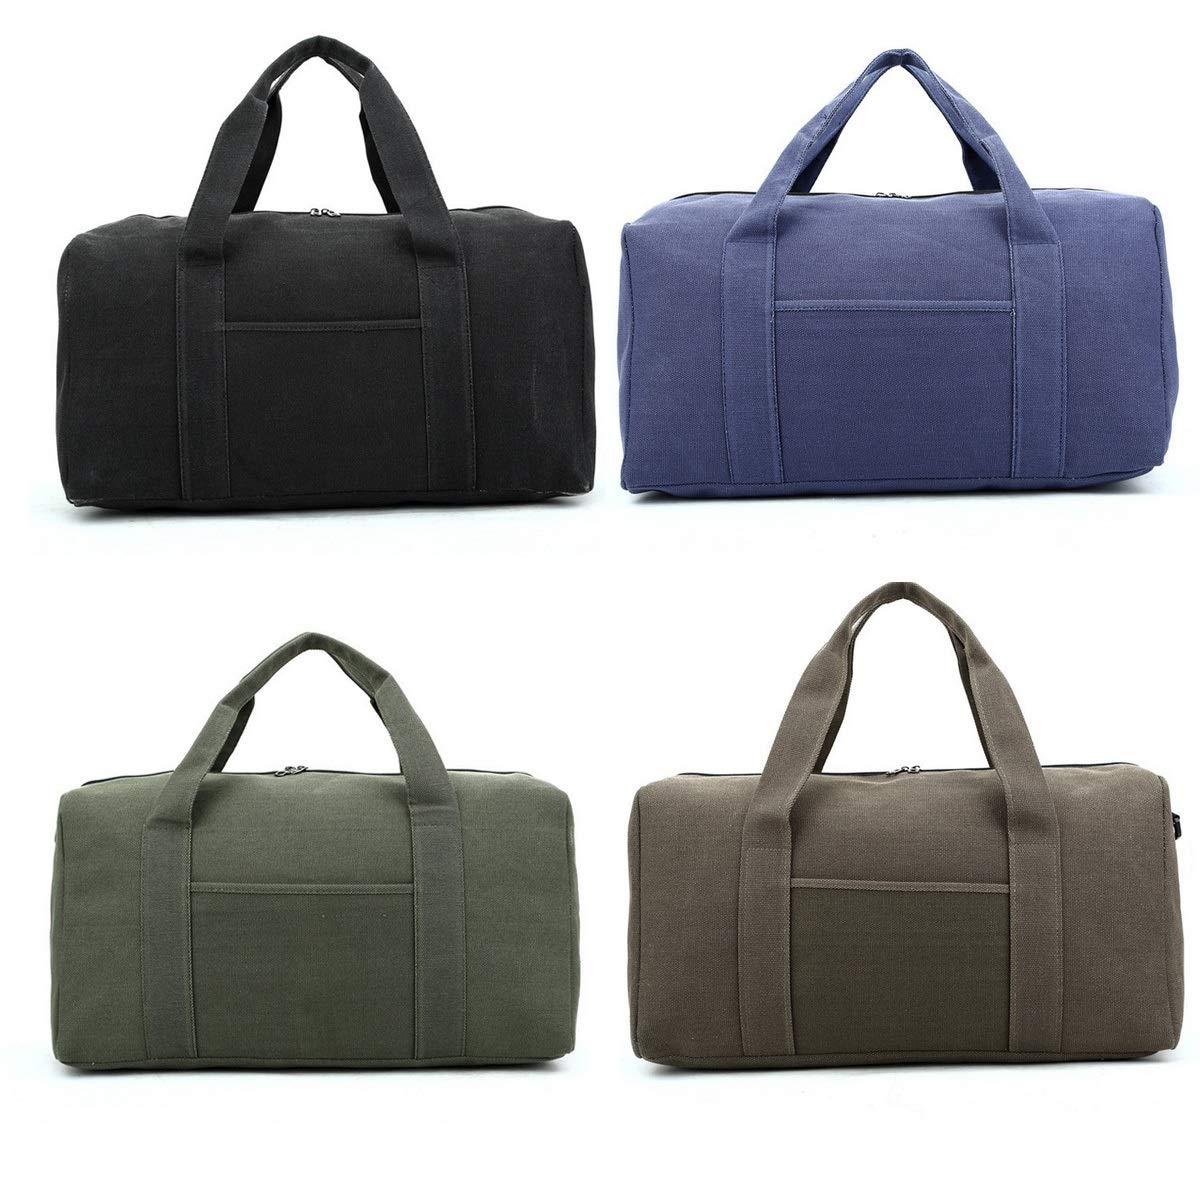 MINRUIGONGMAO Duffel Bag Canvas Tote 272747CM Philadelphia Mall Travel Cla Choice